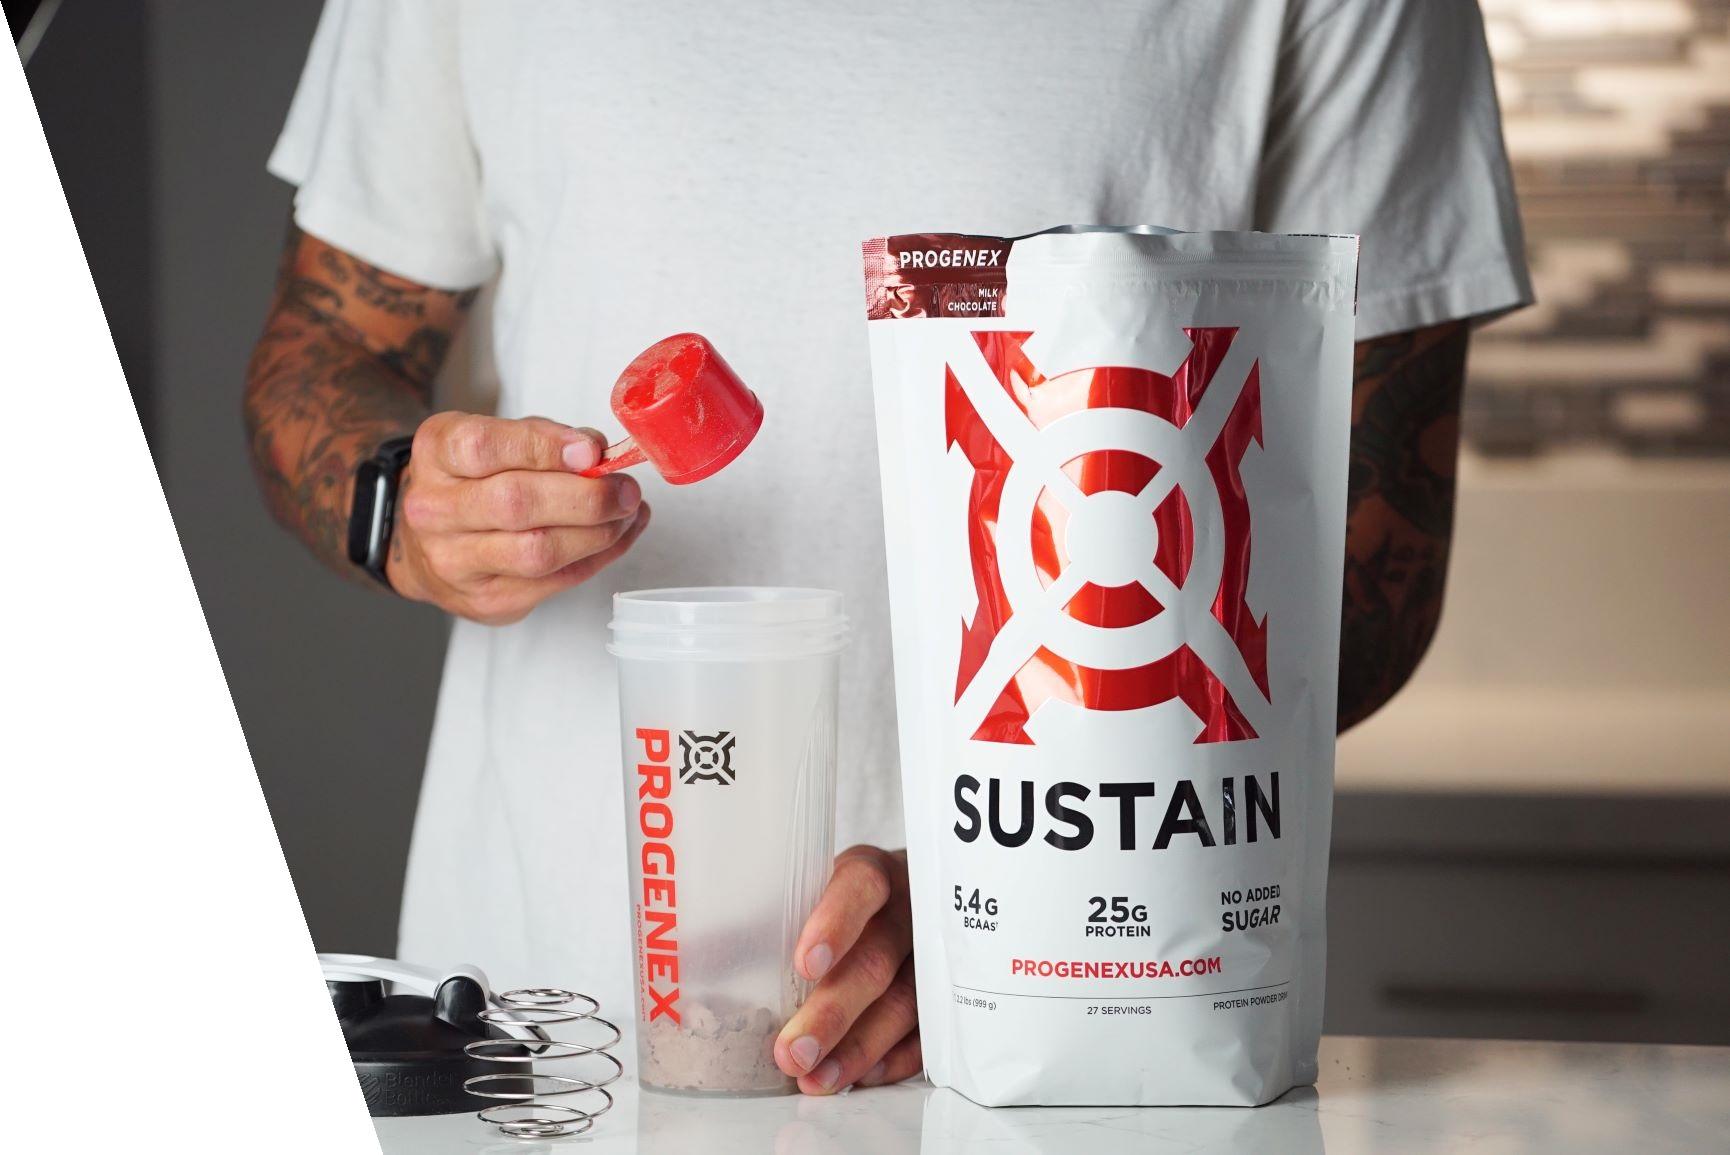 Progenex Sustain whey protein isolate delicious shake being prepared